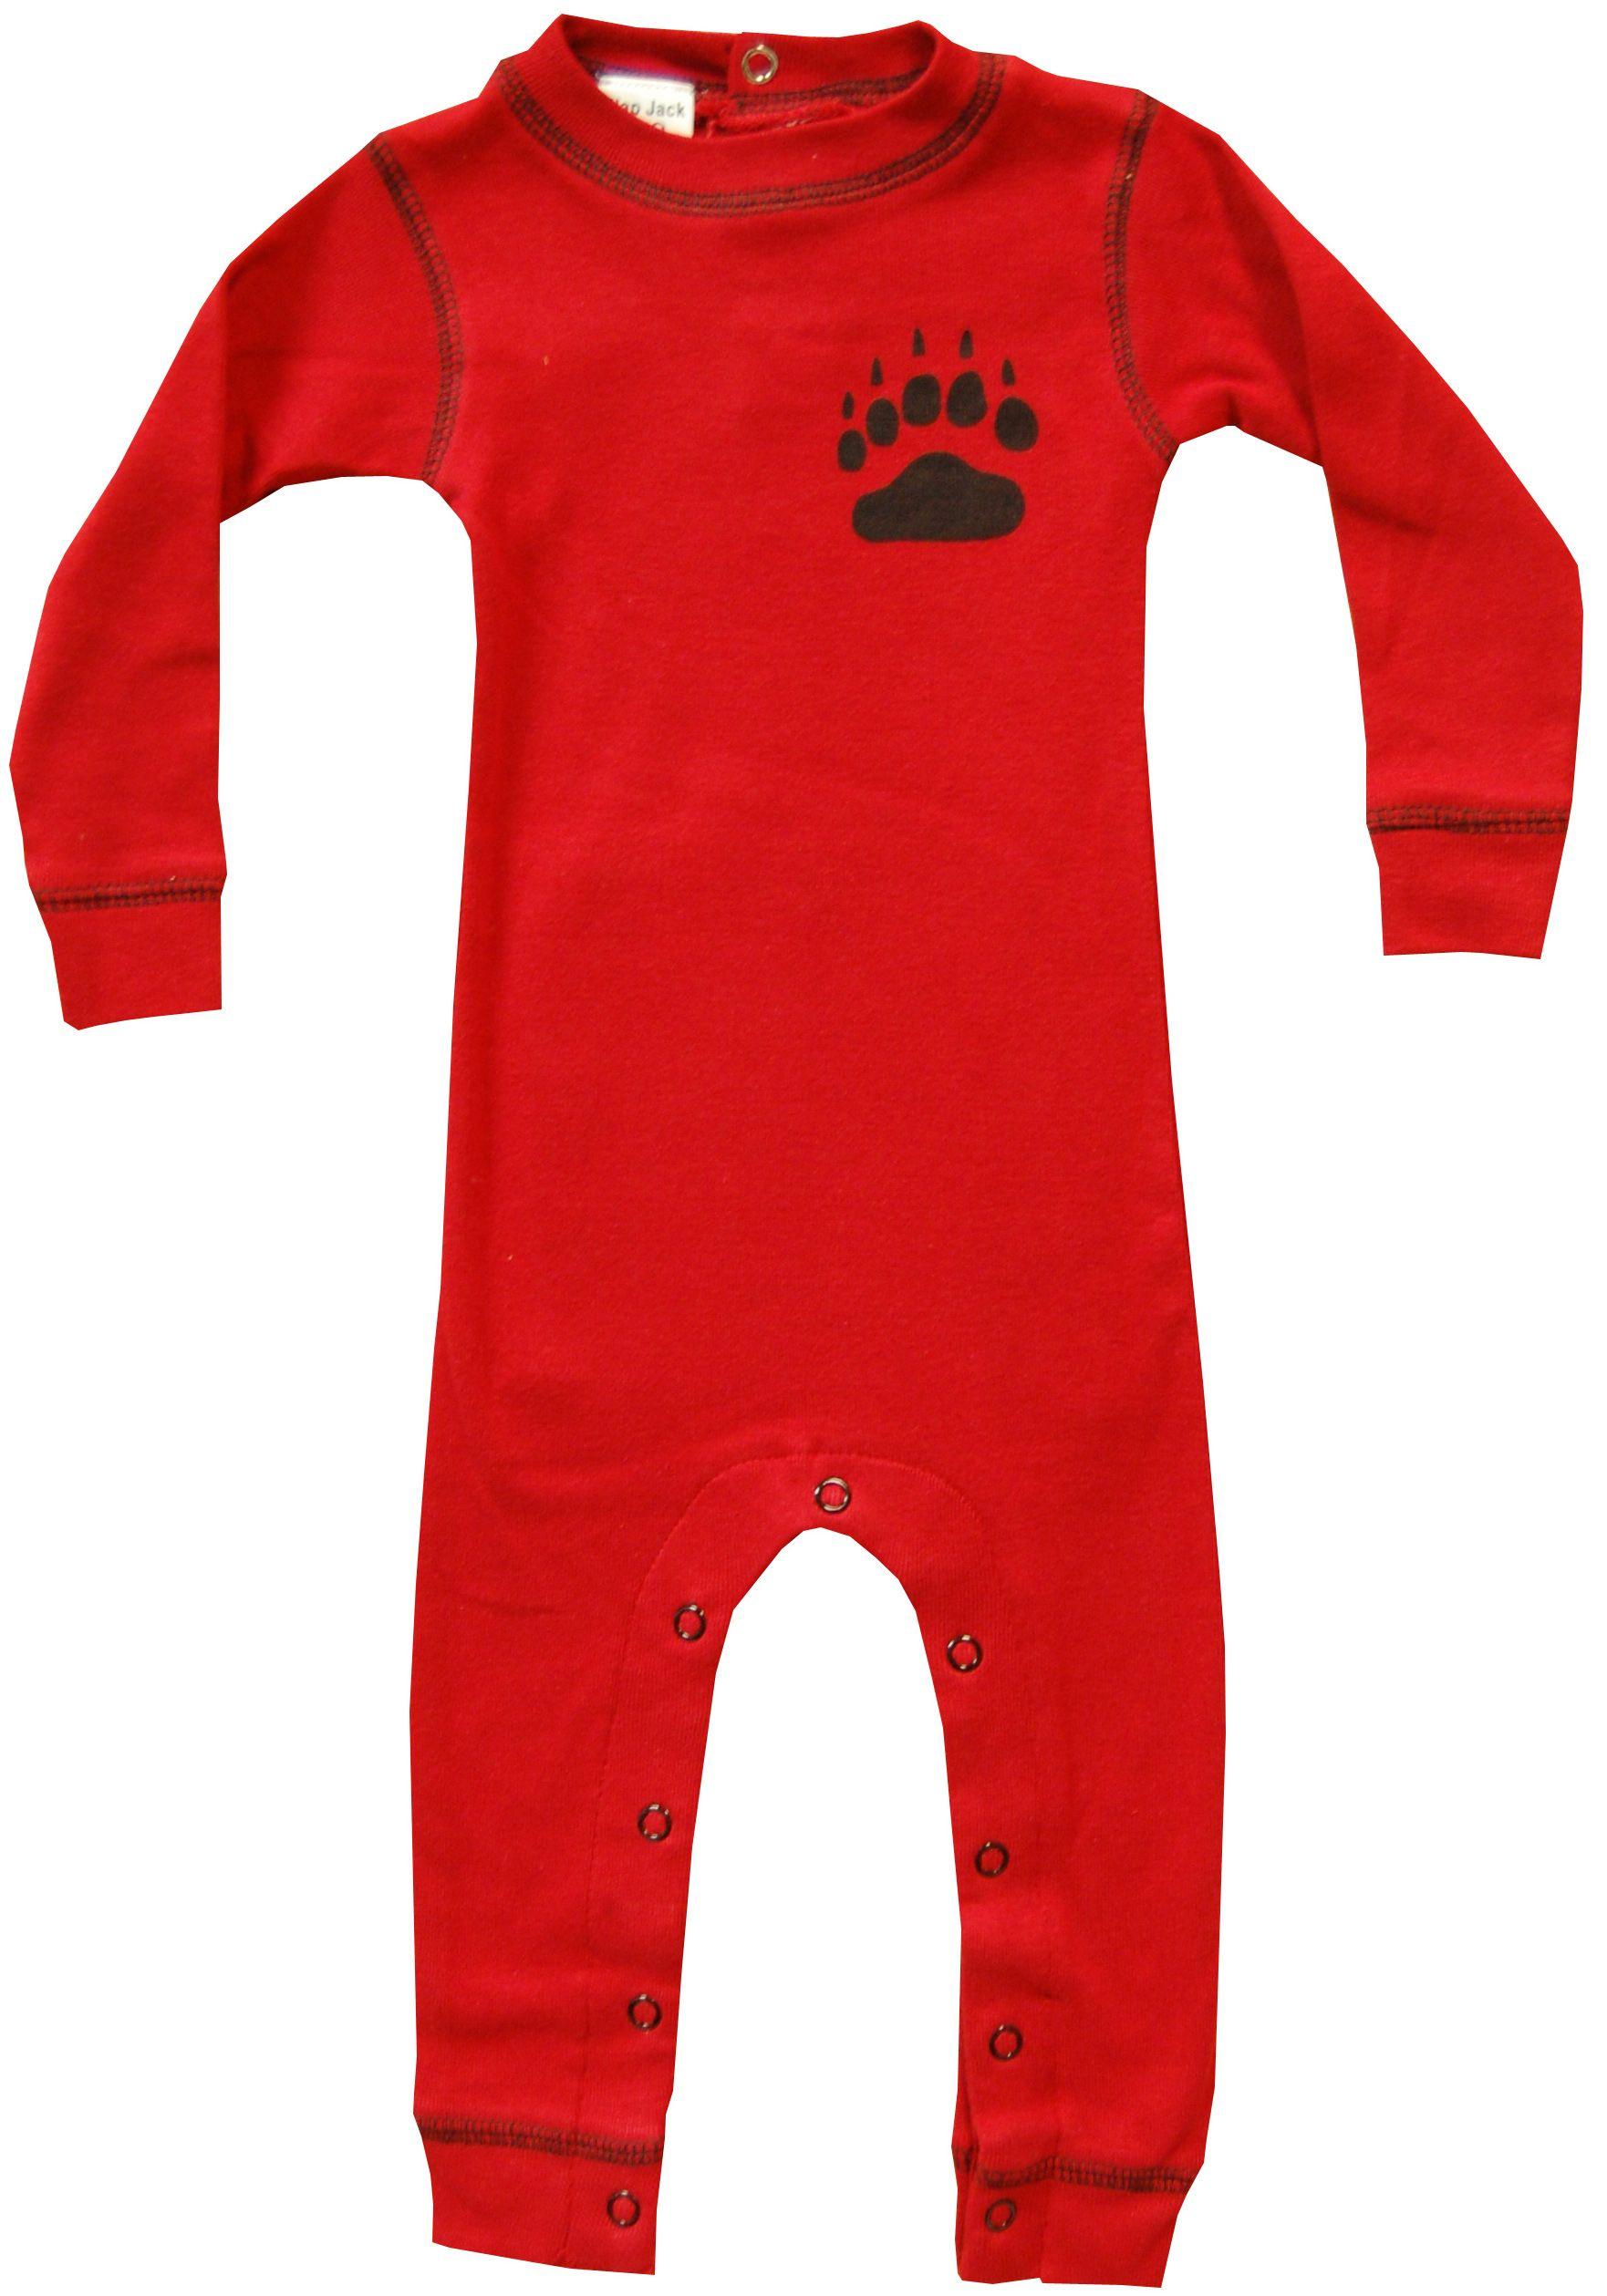 LazyOne Bear Bottom FlapJacks Infant Long John #SleepyHeads www.sleepyheads.com